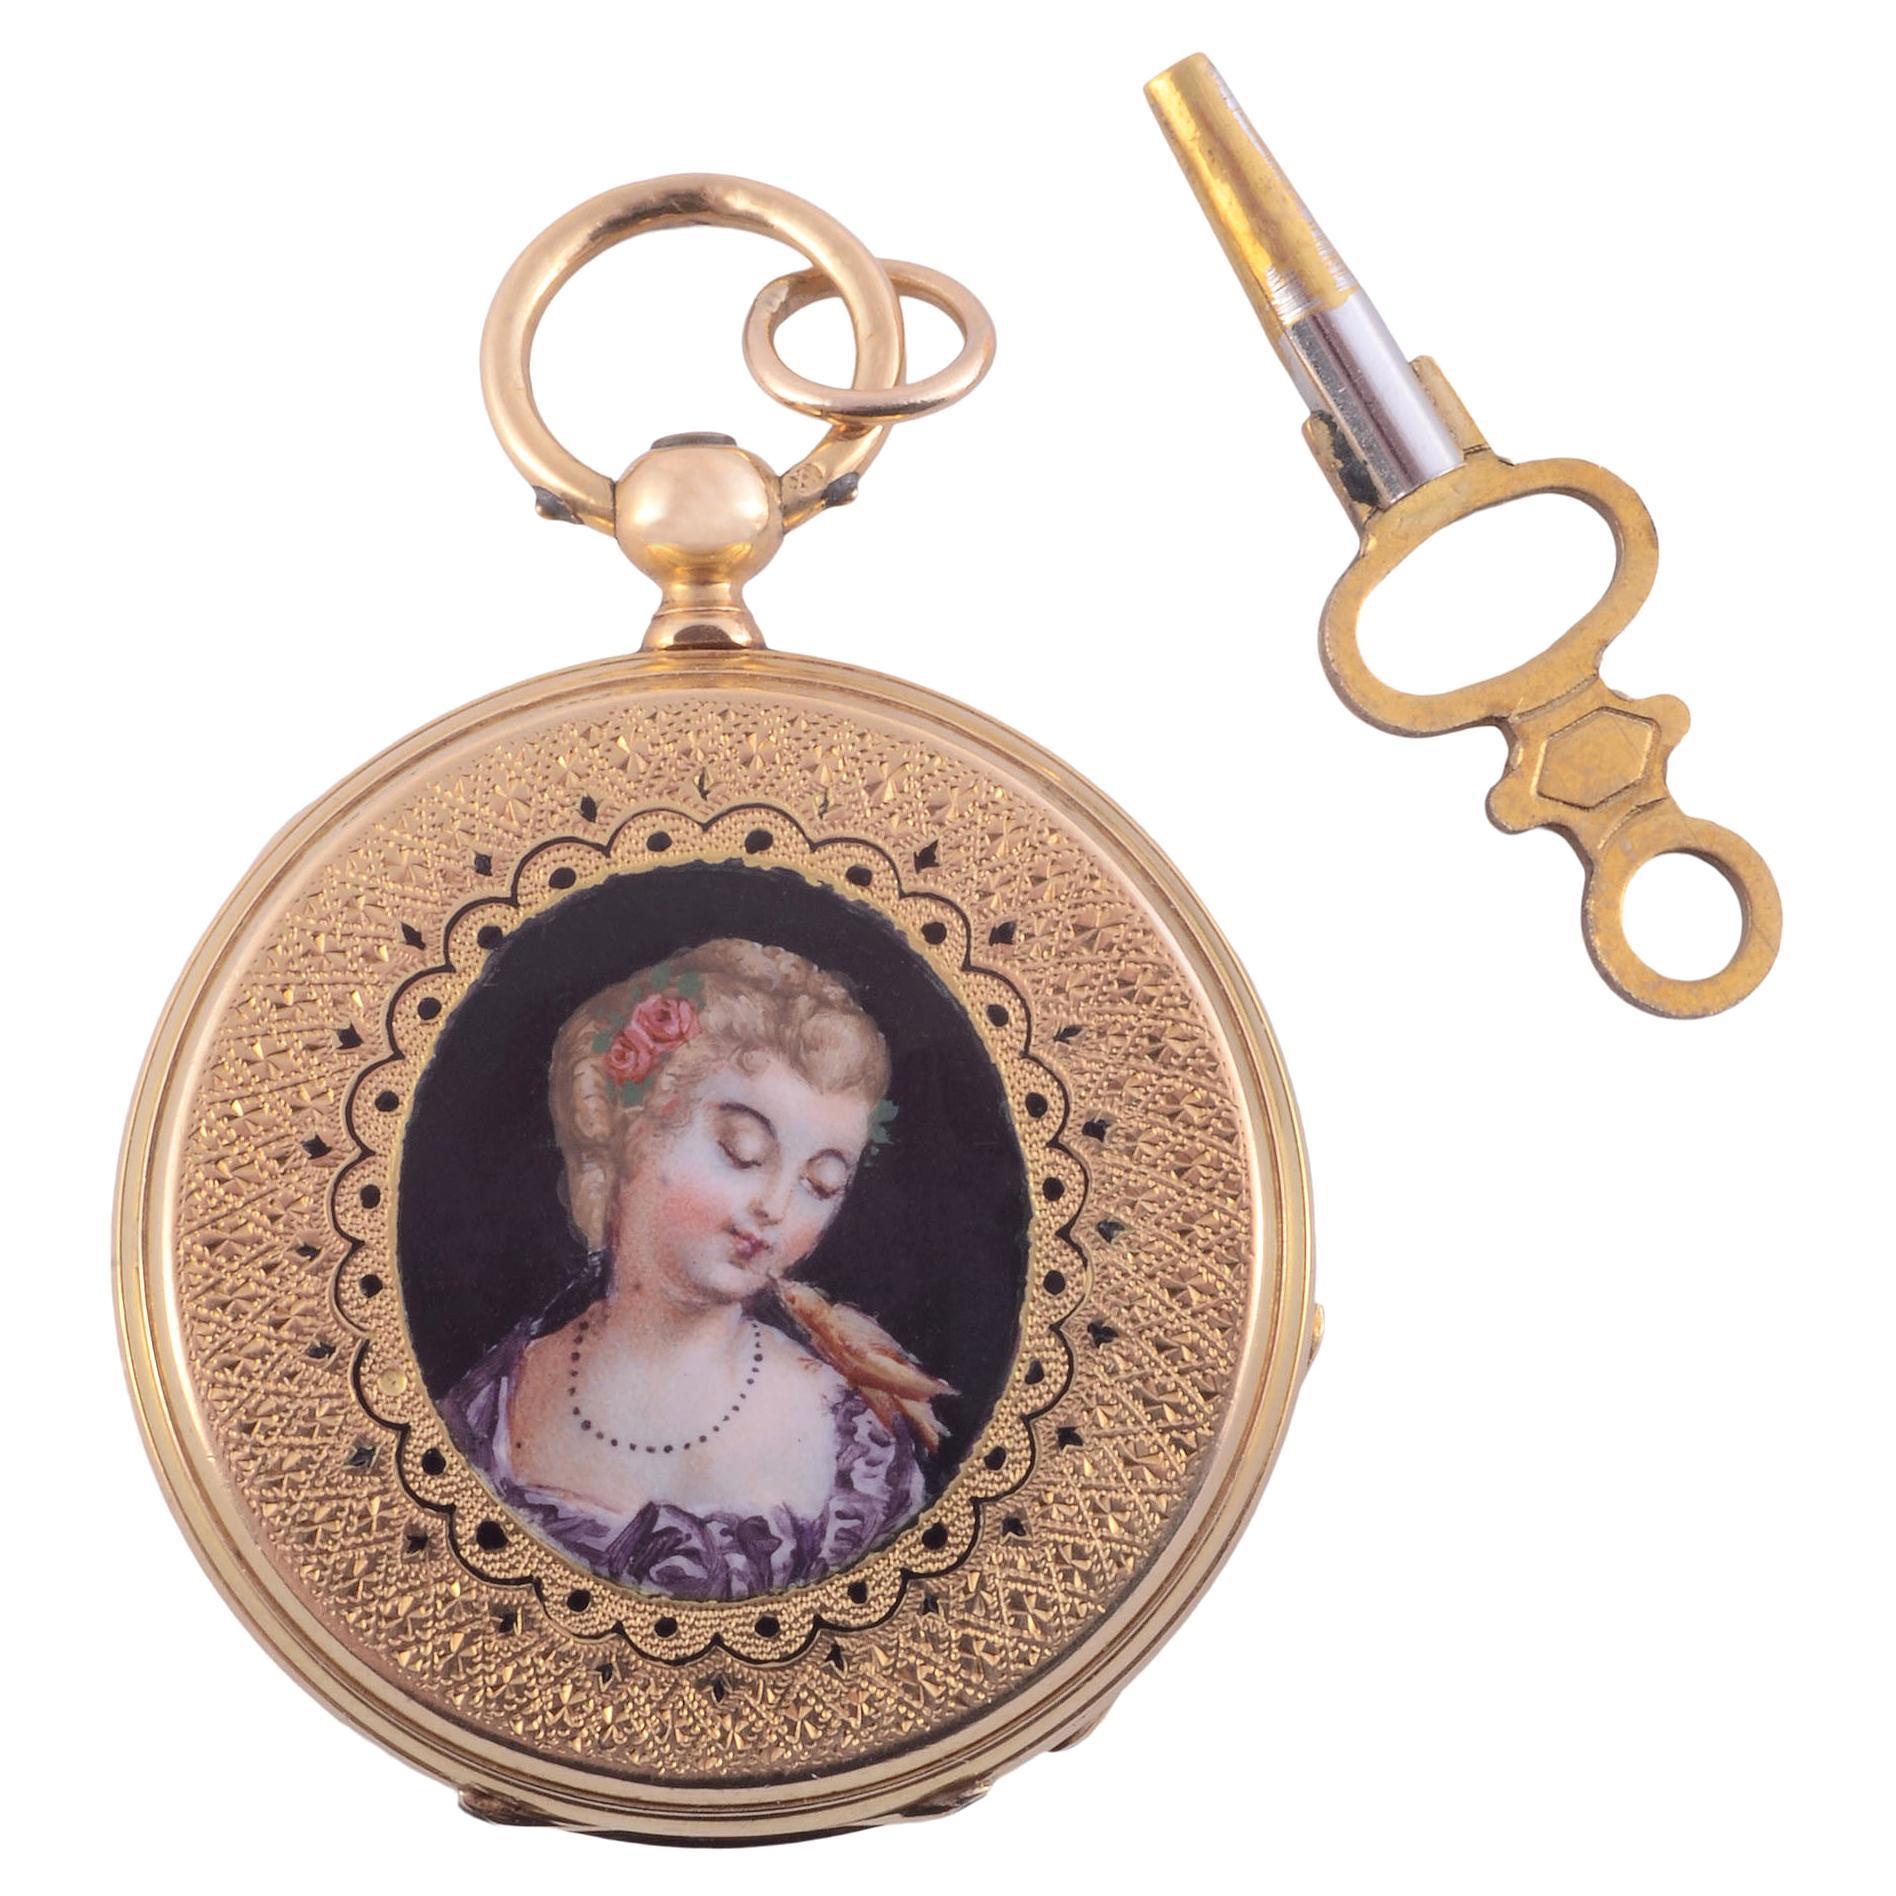 E Bronner & Cie Portrait Hunter Case 18k Pocket Watch